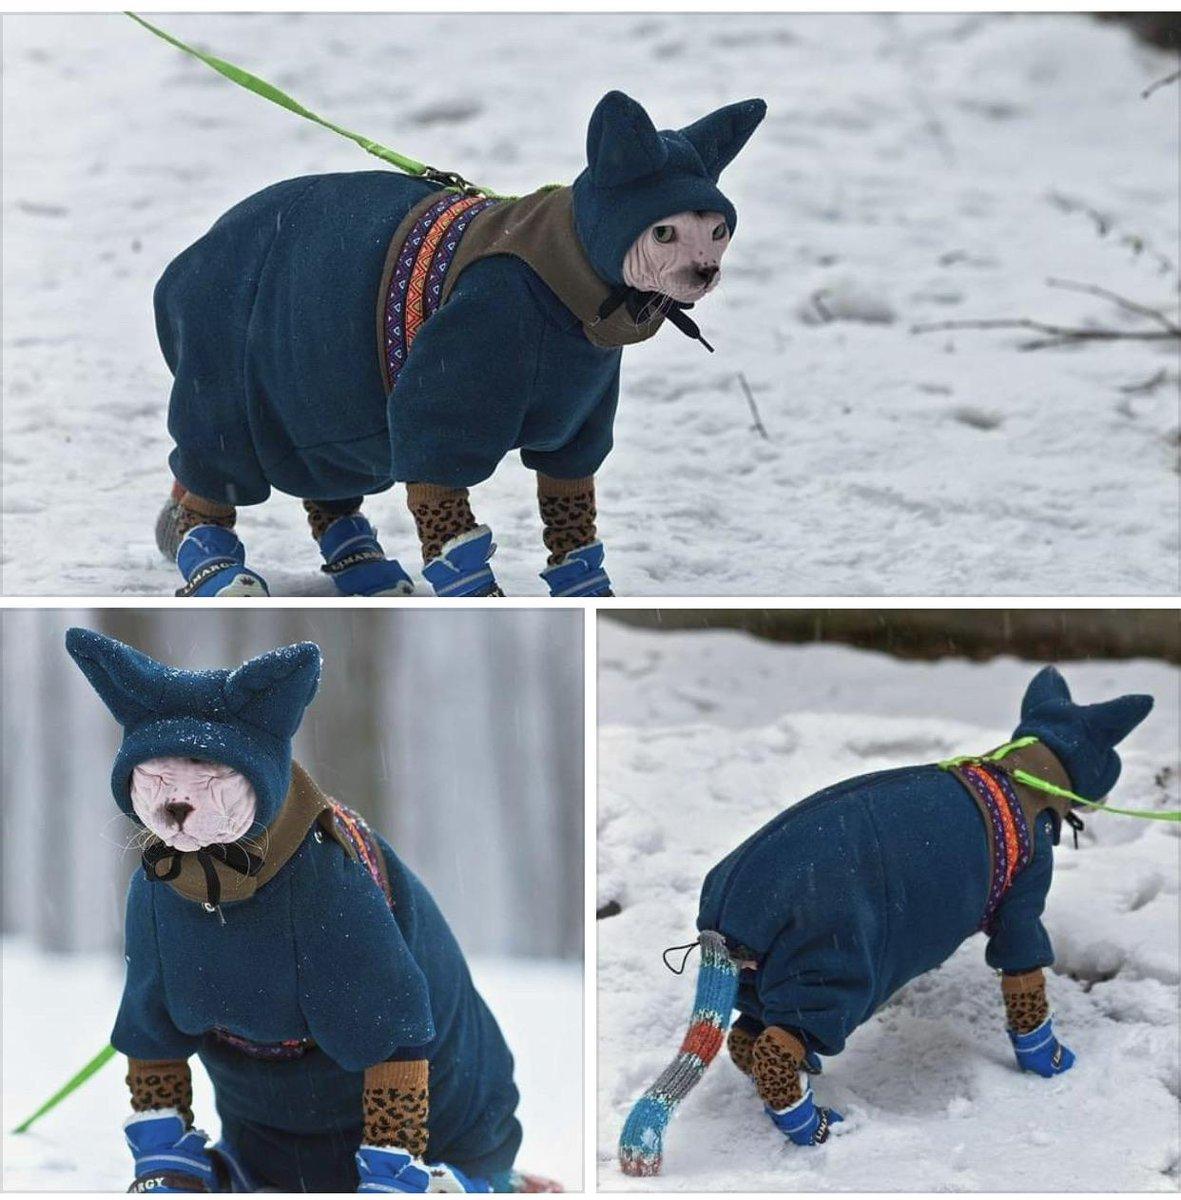 nekkid cat has to bundle up for cold weather #bundles #ilovecats pic.twitter.com/qZJO8wEVPj